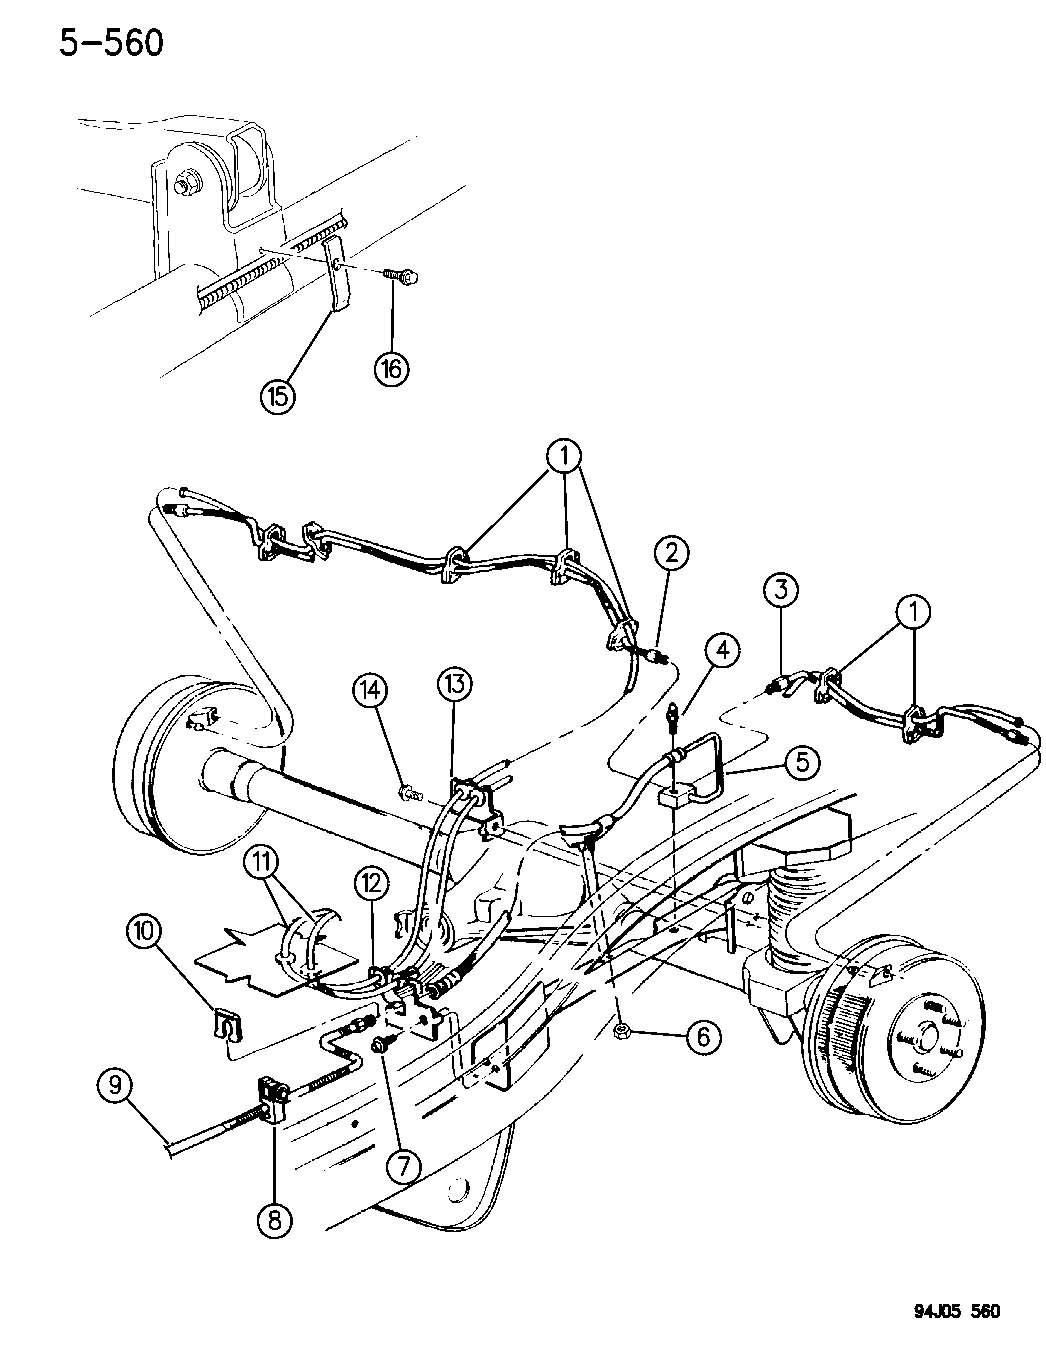 1997 Jeep Wrangler Hose. Brake. Rear, axle, brakes